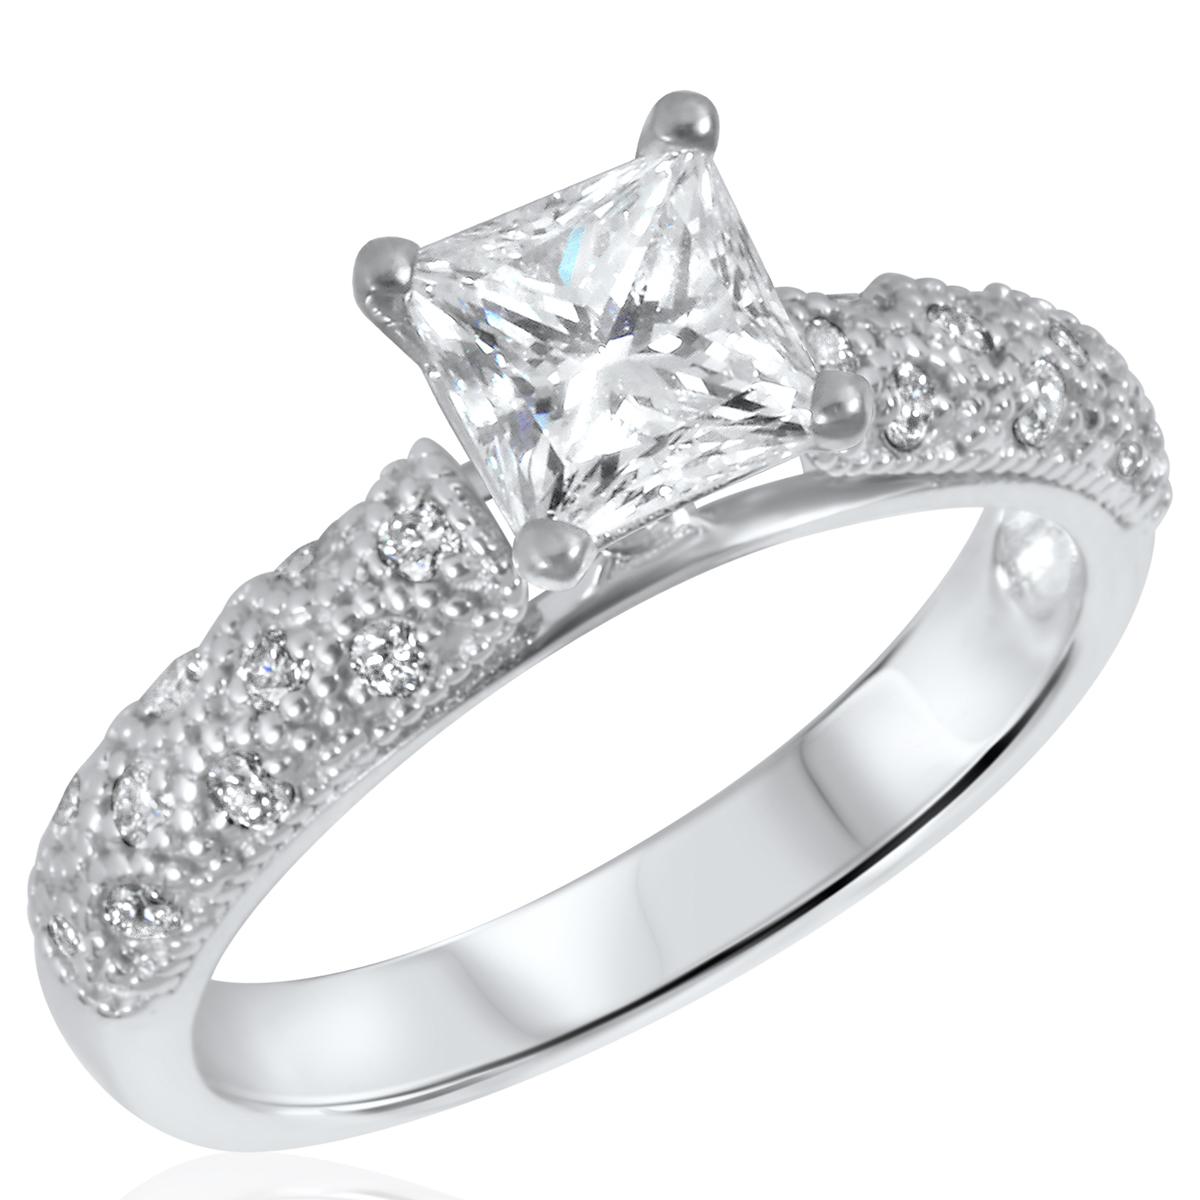 1 1/5 CT. T.W. Diamond Ladies Engagement Ring 14K White Gold- Size 8